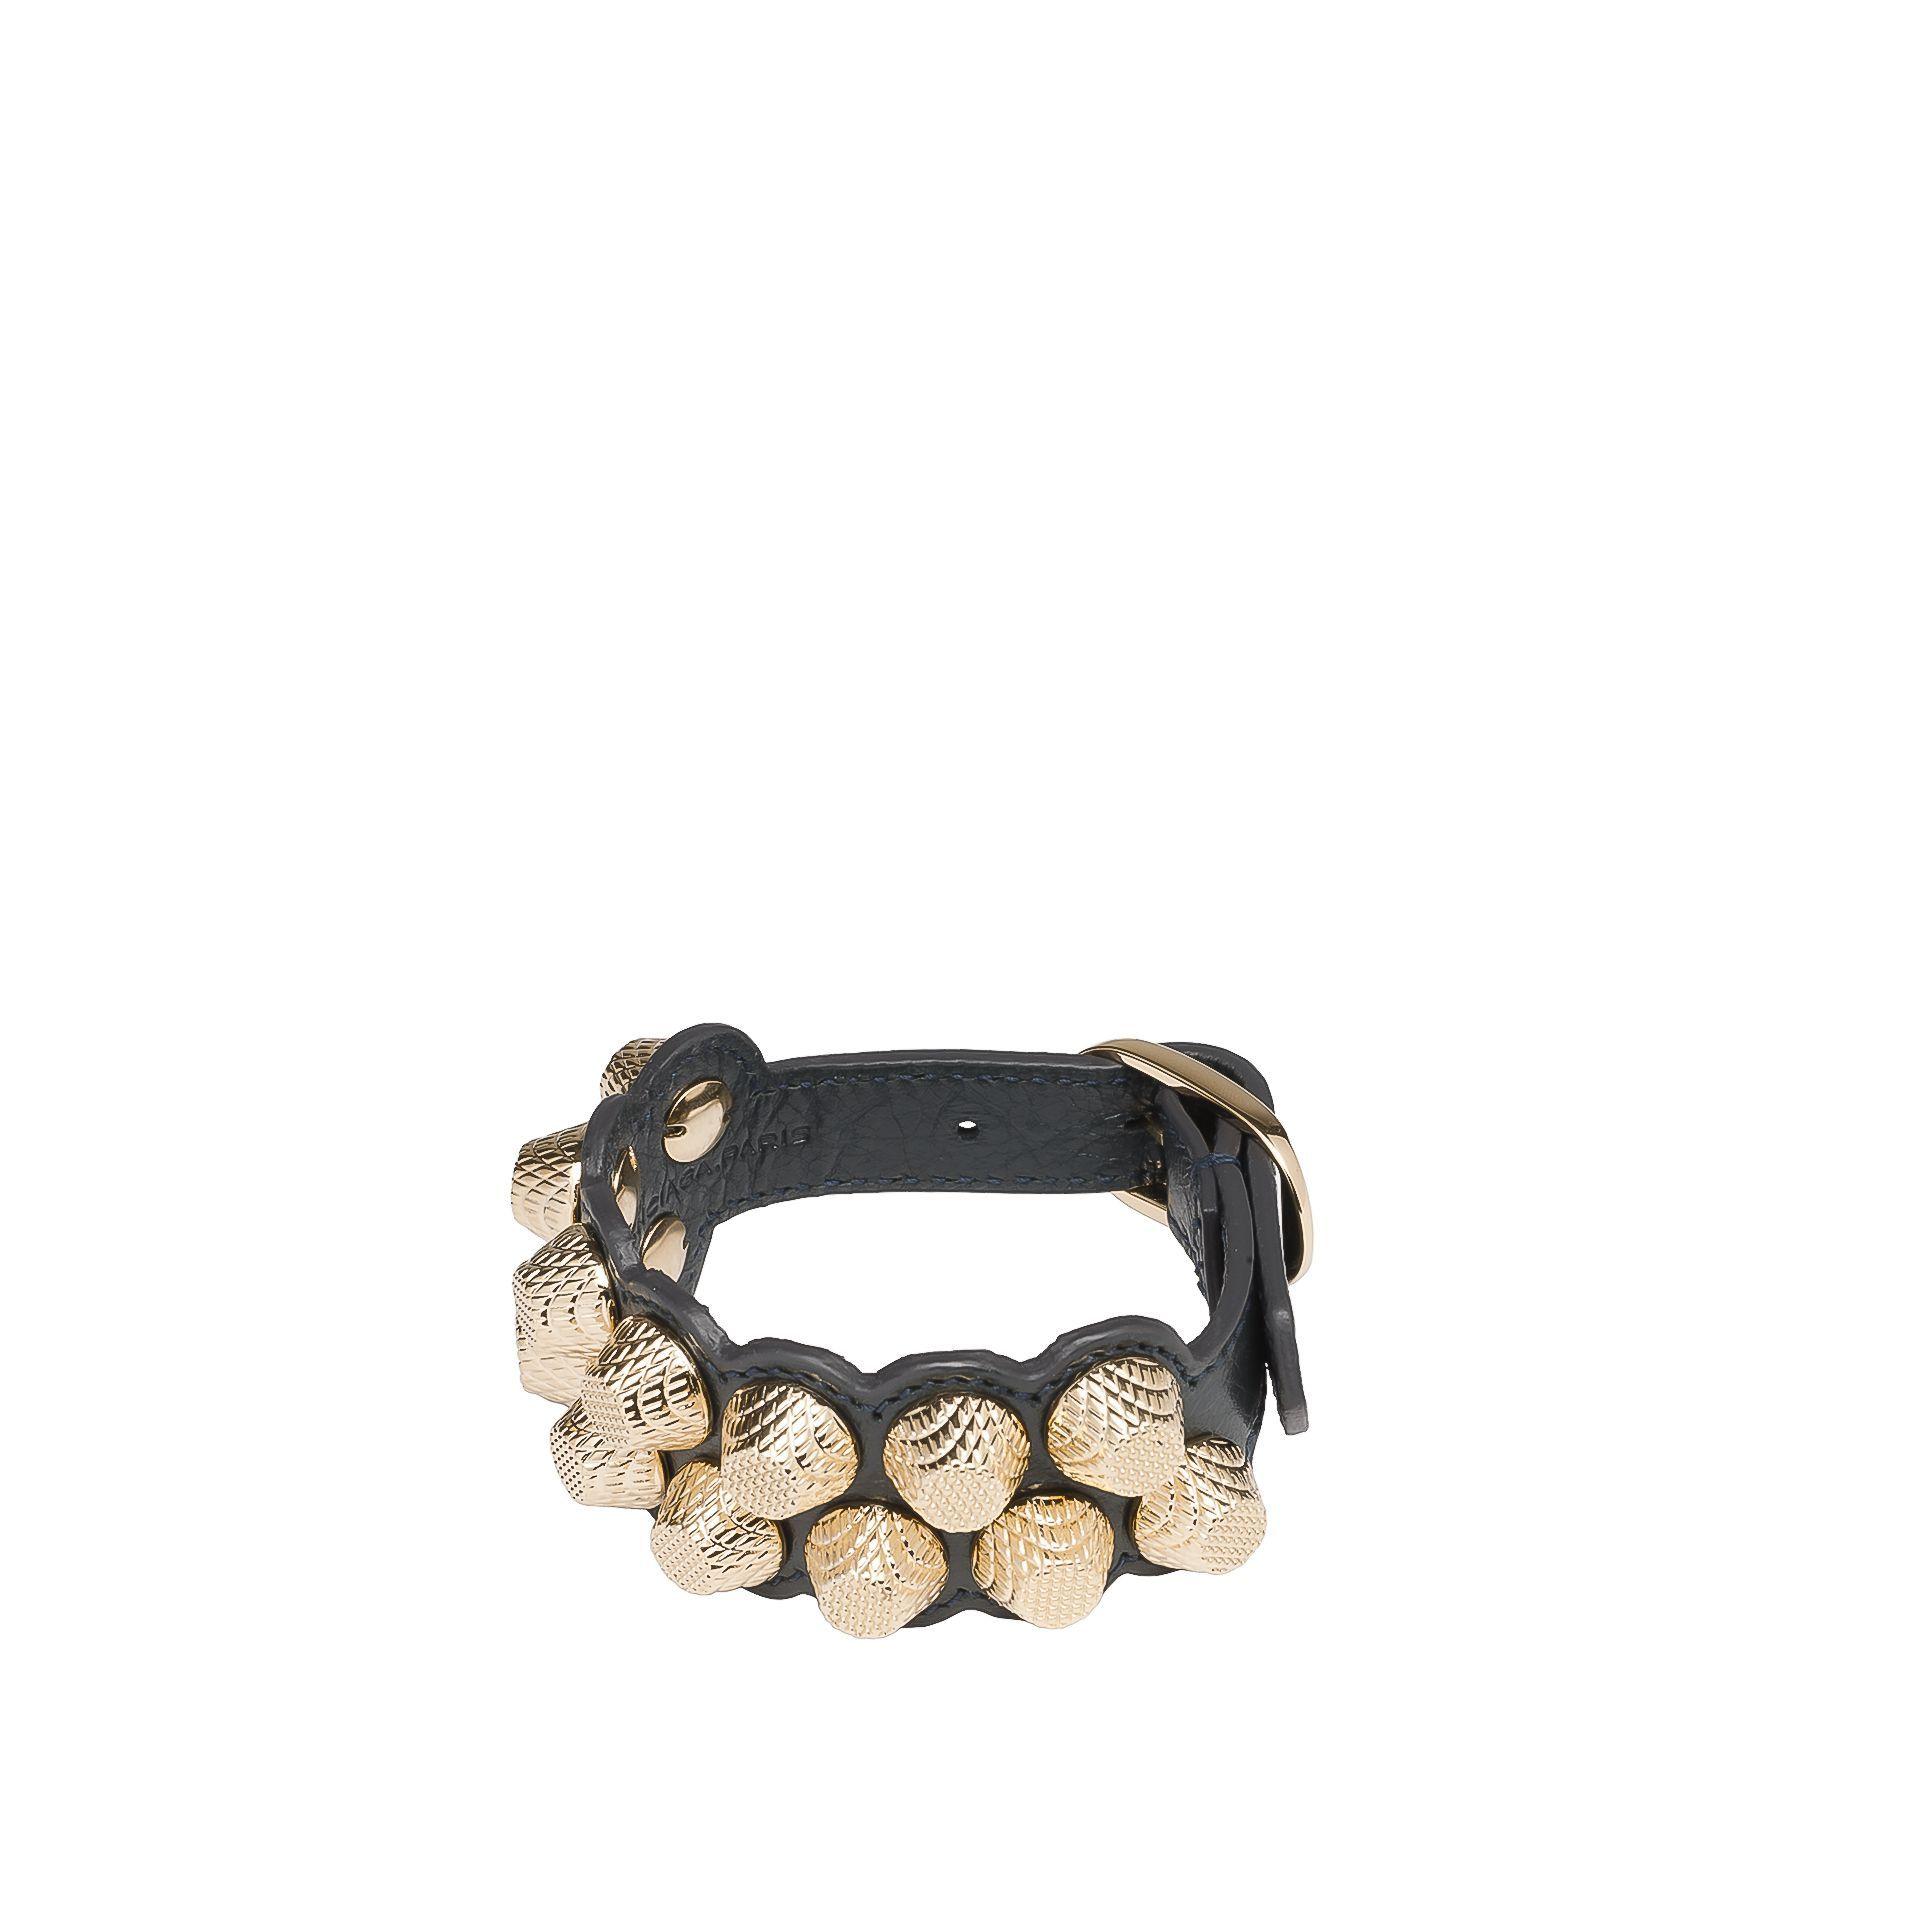 Balenciaga giant gold bracelet stud m balenciaga bracelets women